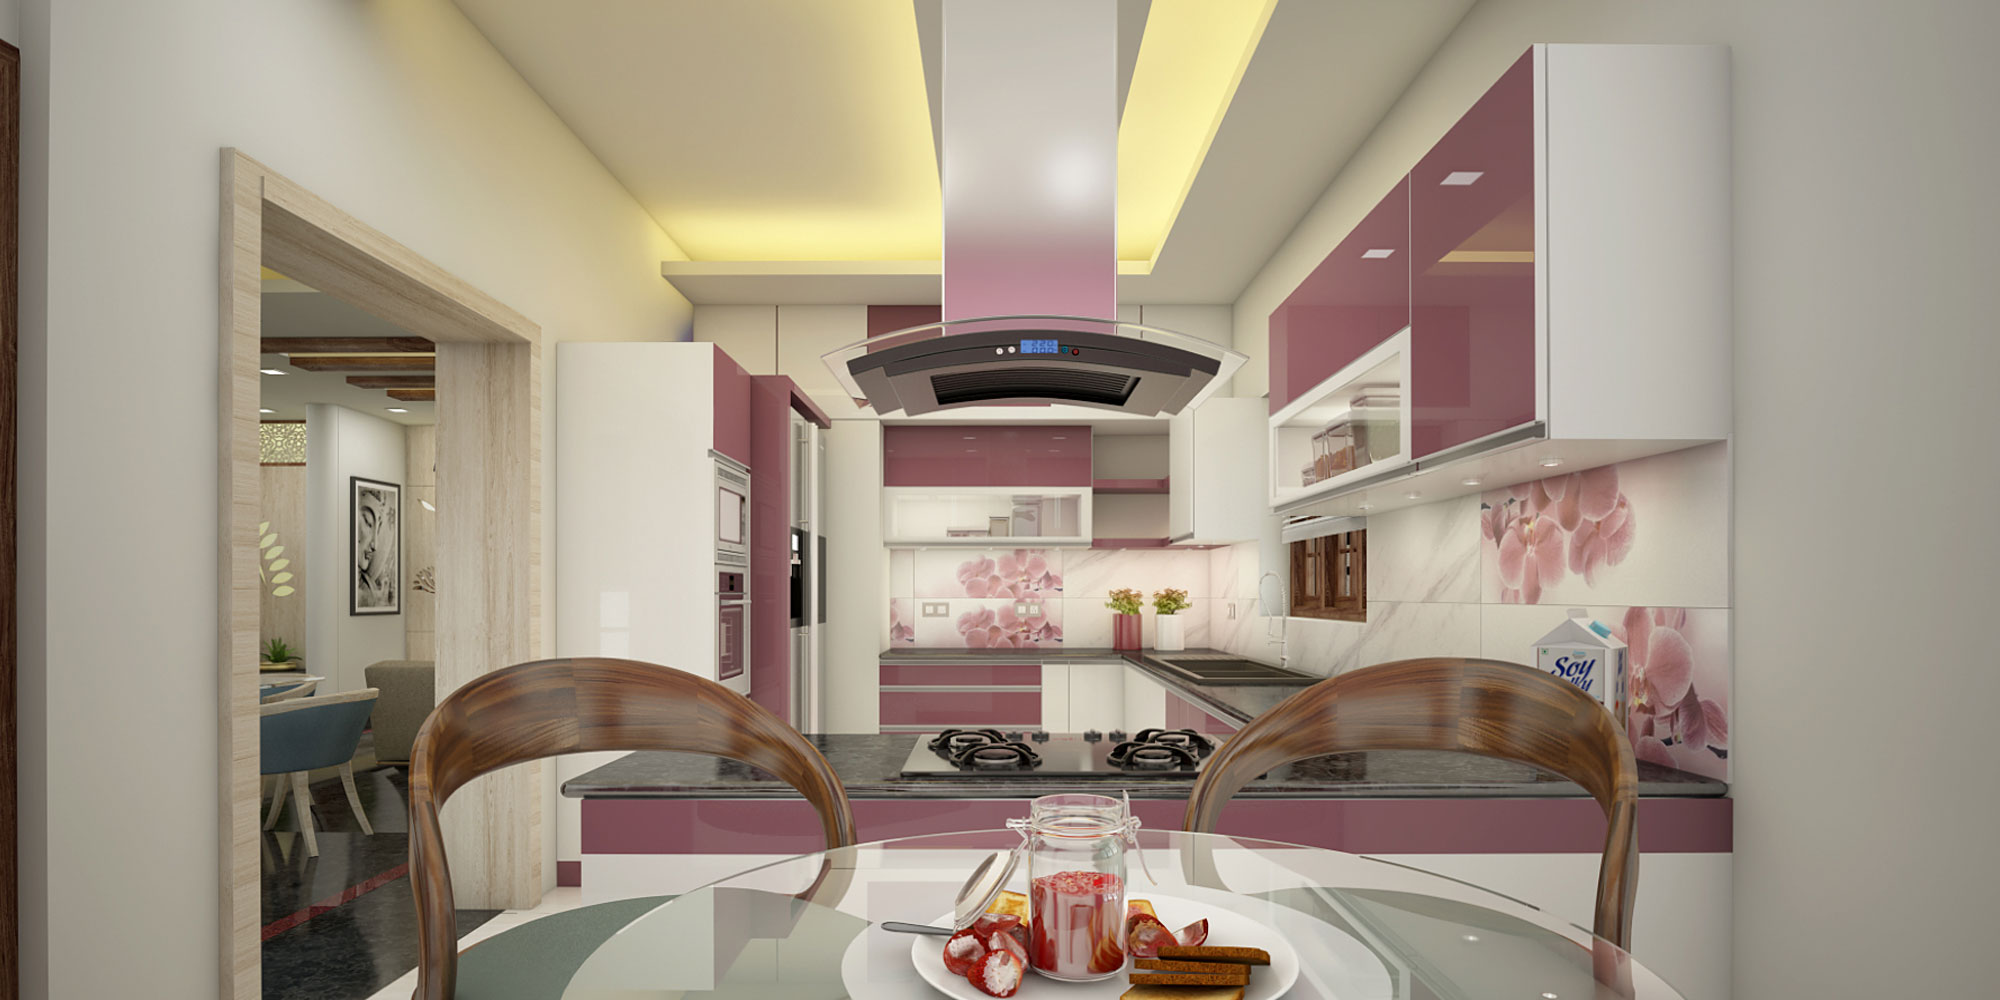 Modular kitchen designers in Kerala